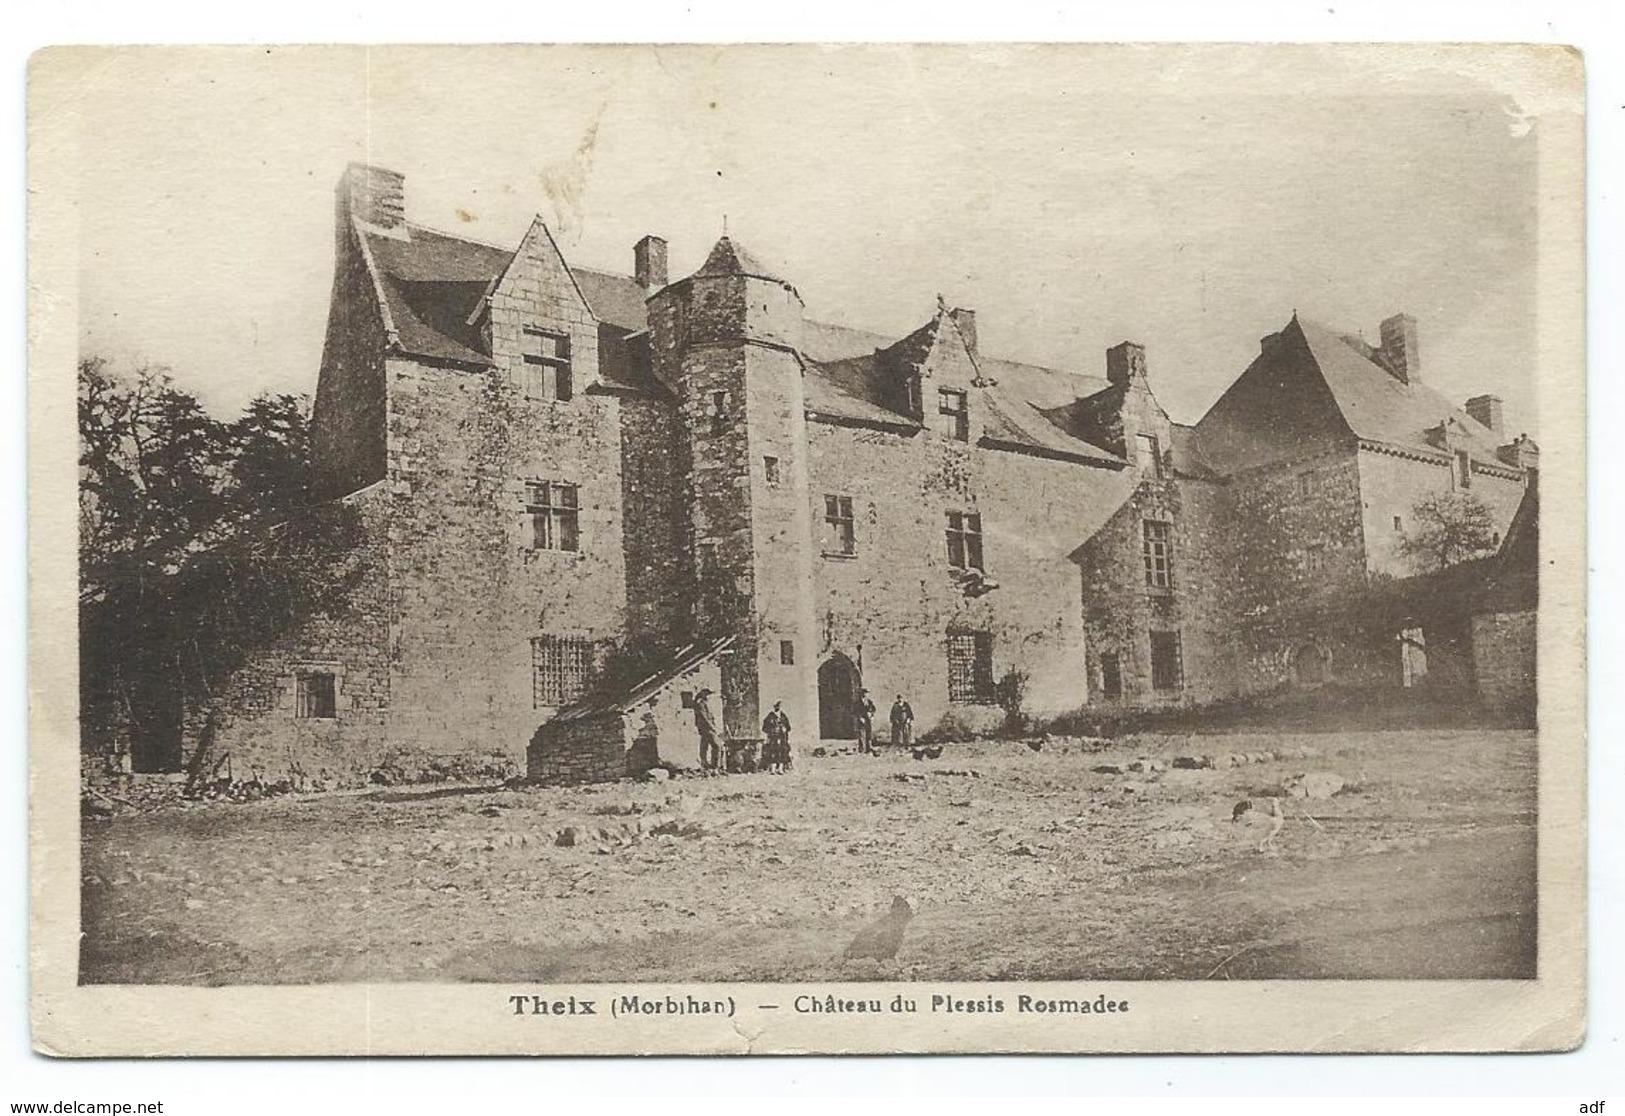 CPSM THEIX, PETITE ANIMATION DEVANT LE CHATEAU DU PLESSIS ROSMADEE, MORBIHAN 56 - France